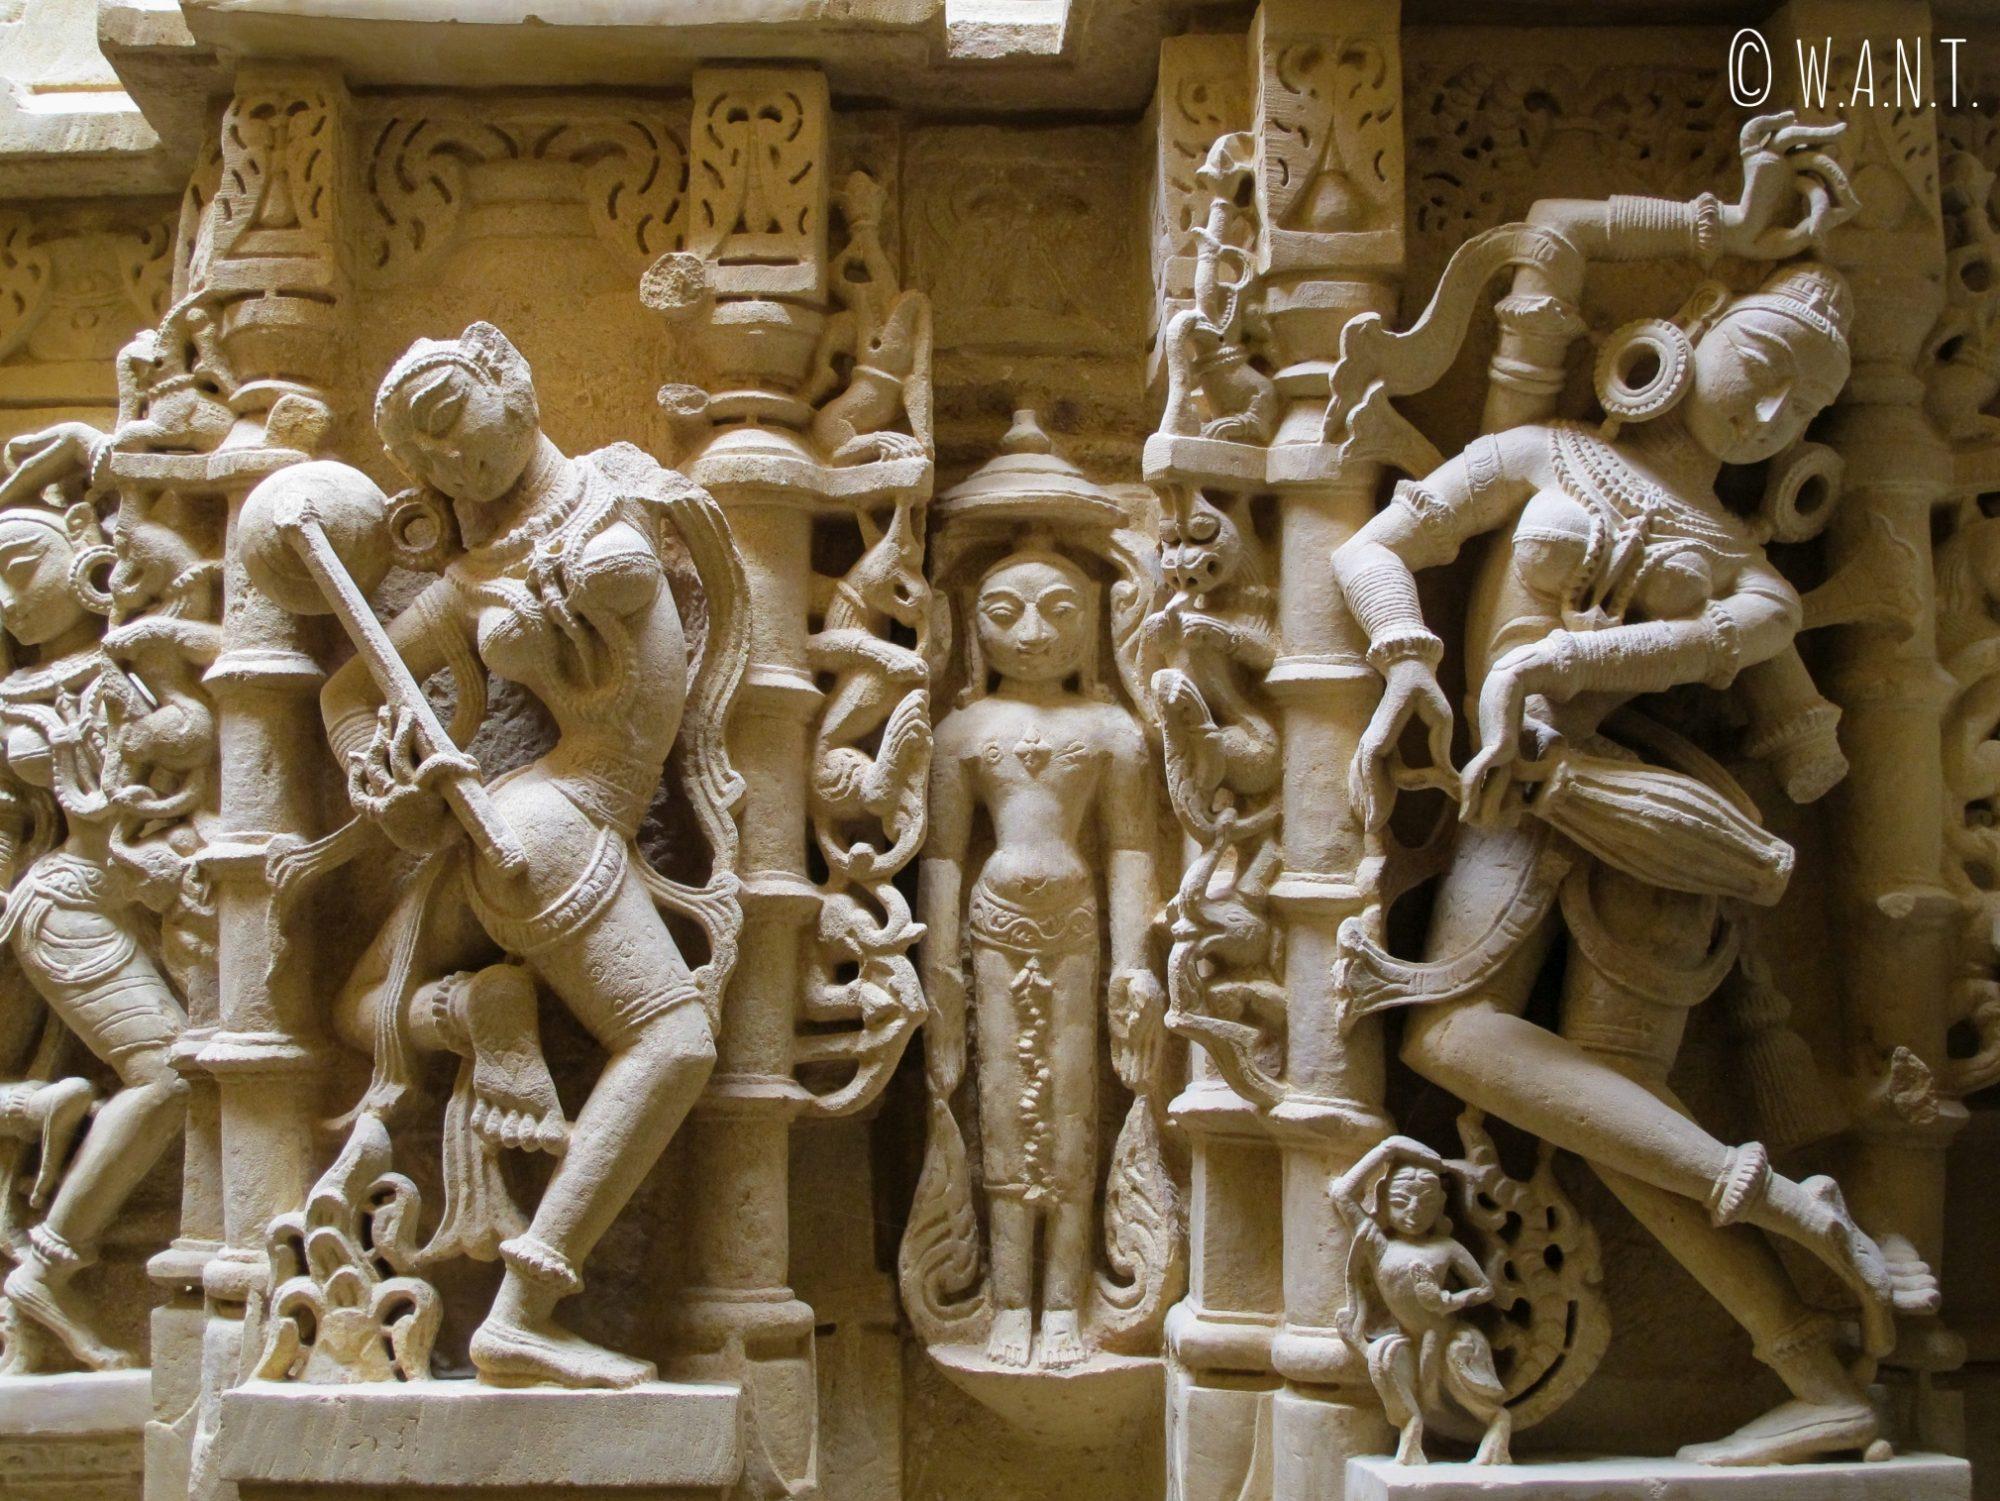 Mur sculpté à l'éffigie de Shiva dans un temple Jain du fort de Jaisalmer